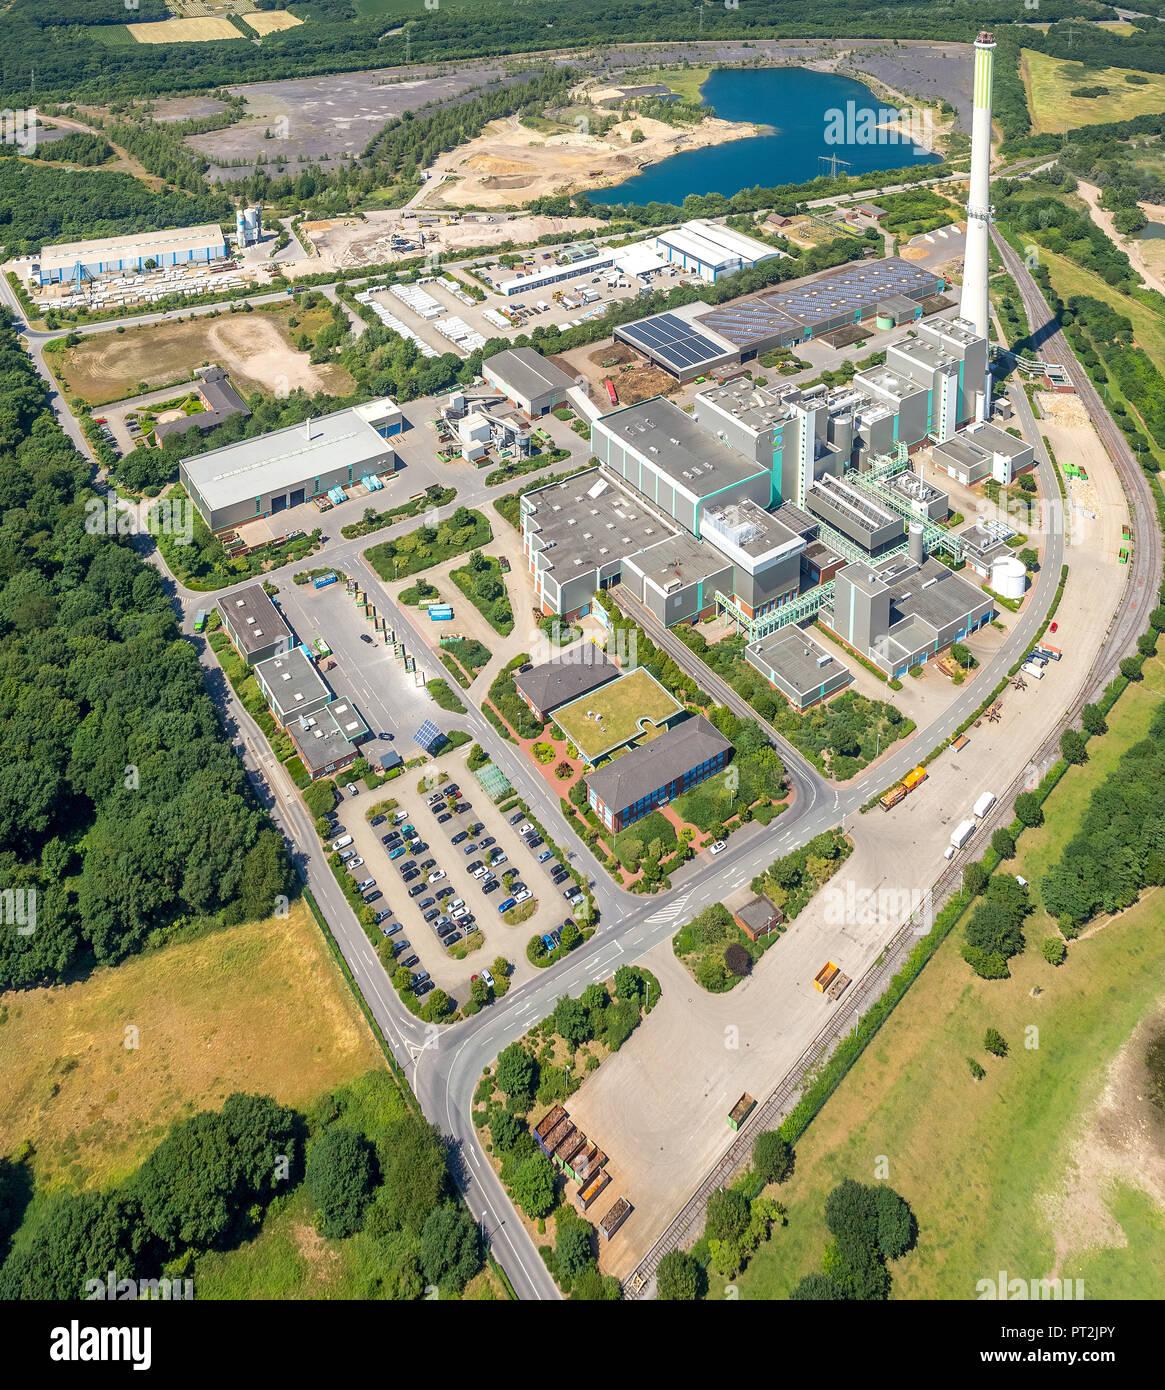 Centro de disposición de residuos Asdonkshof, empresa de gestión de residuos, la incineración de residuos, Graftstraße, Elskes Transportbeton GmbH & Co. KG Elskes Fertigteile GmbH & Co. KG, Kamp-Lintfort, área de Ruhr, Renania del Norte-Westfalia, Alemania Imagen De Stock